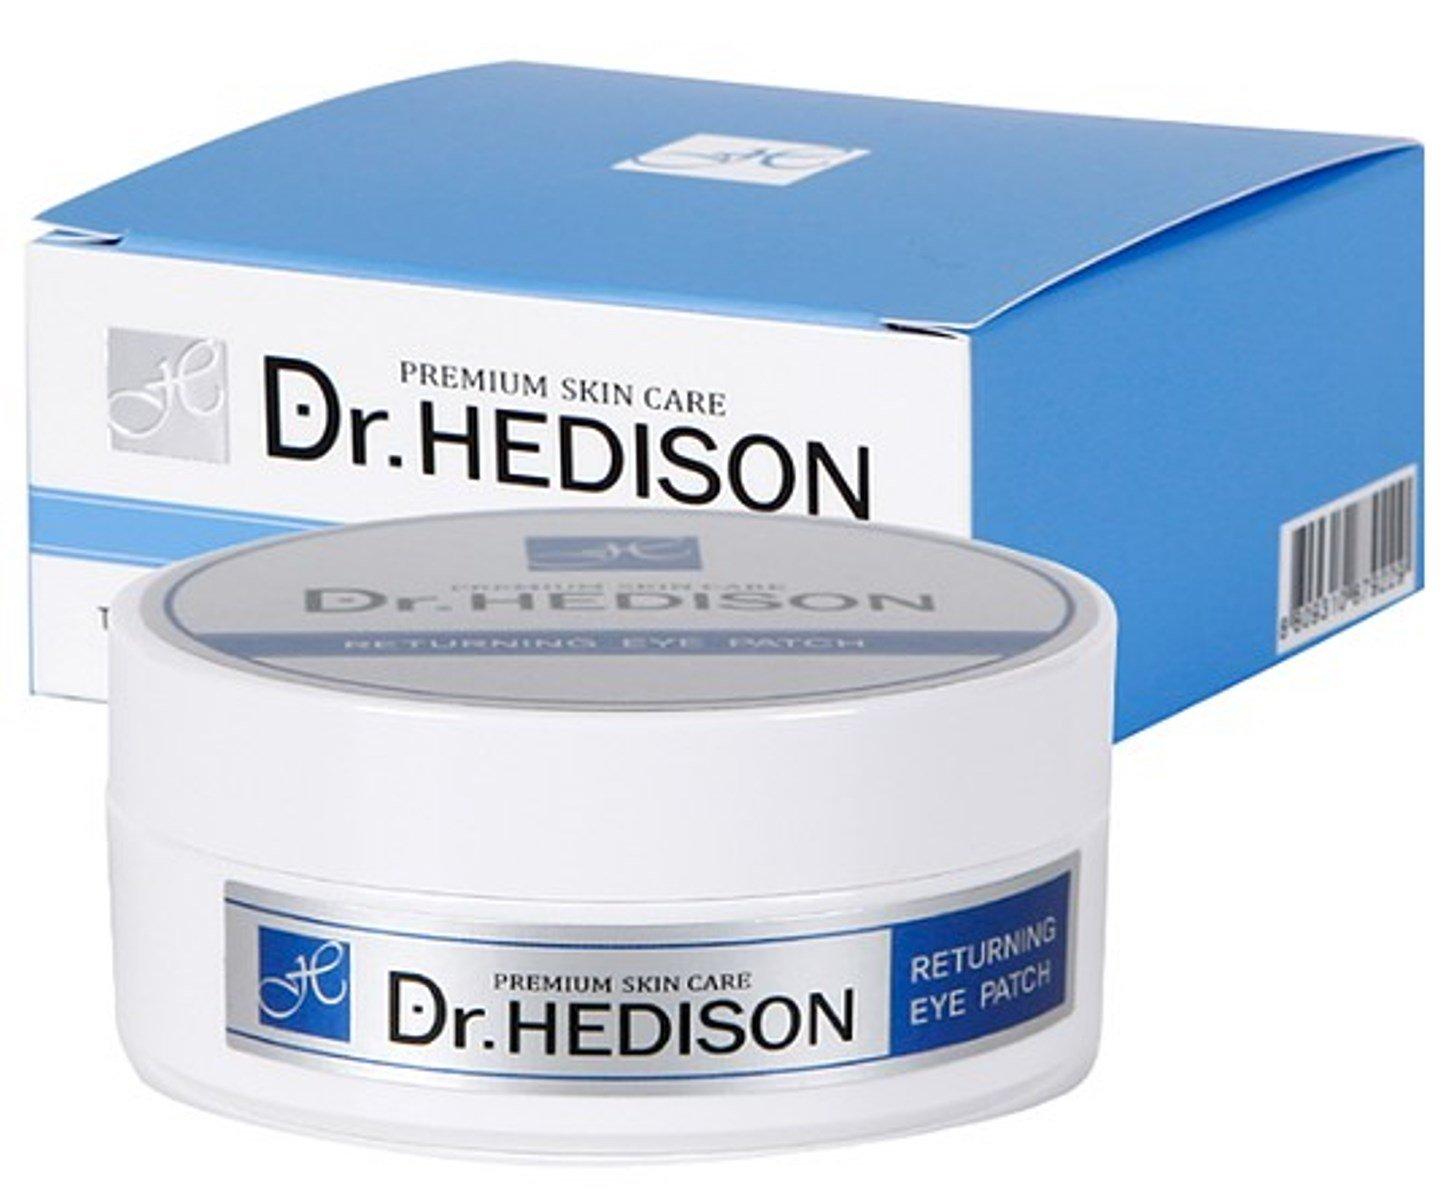 Dr.Hedison Returning Eye Patch 60 pcs